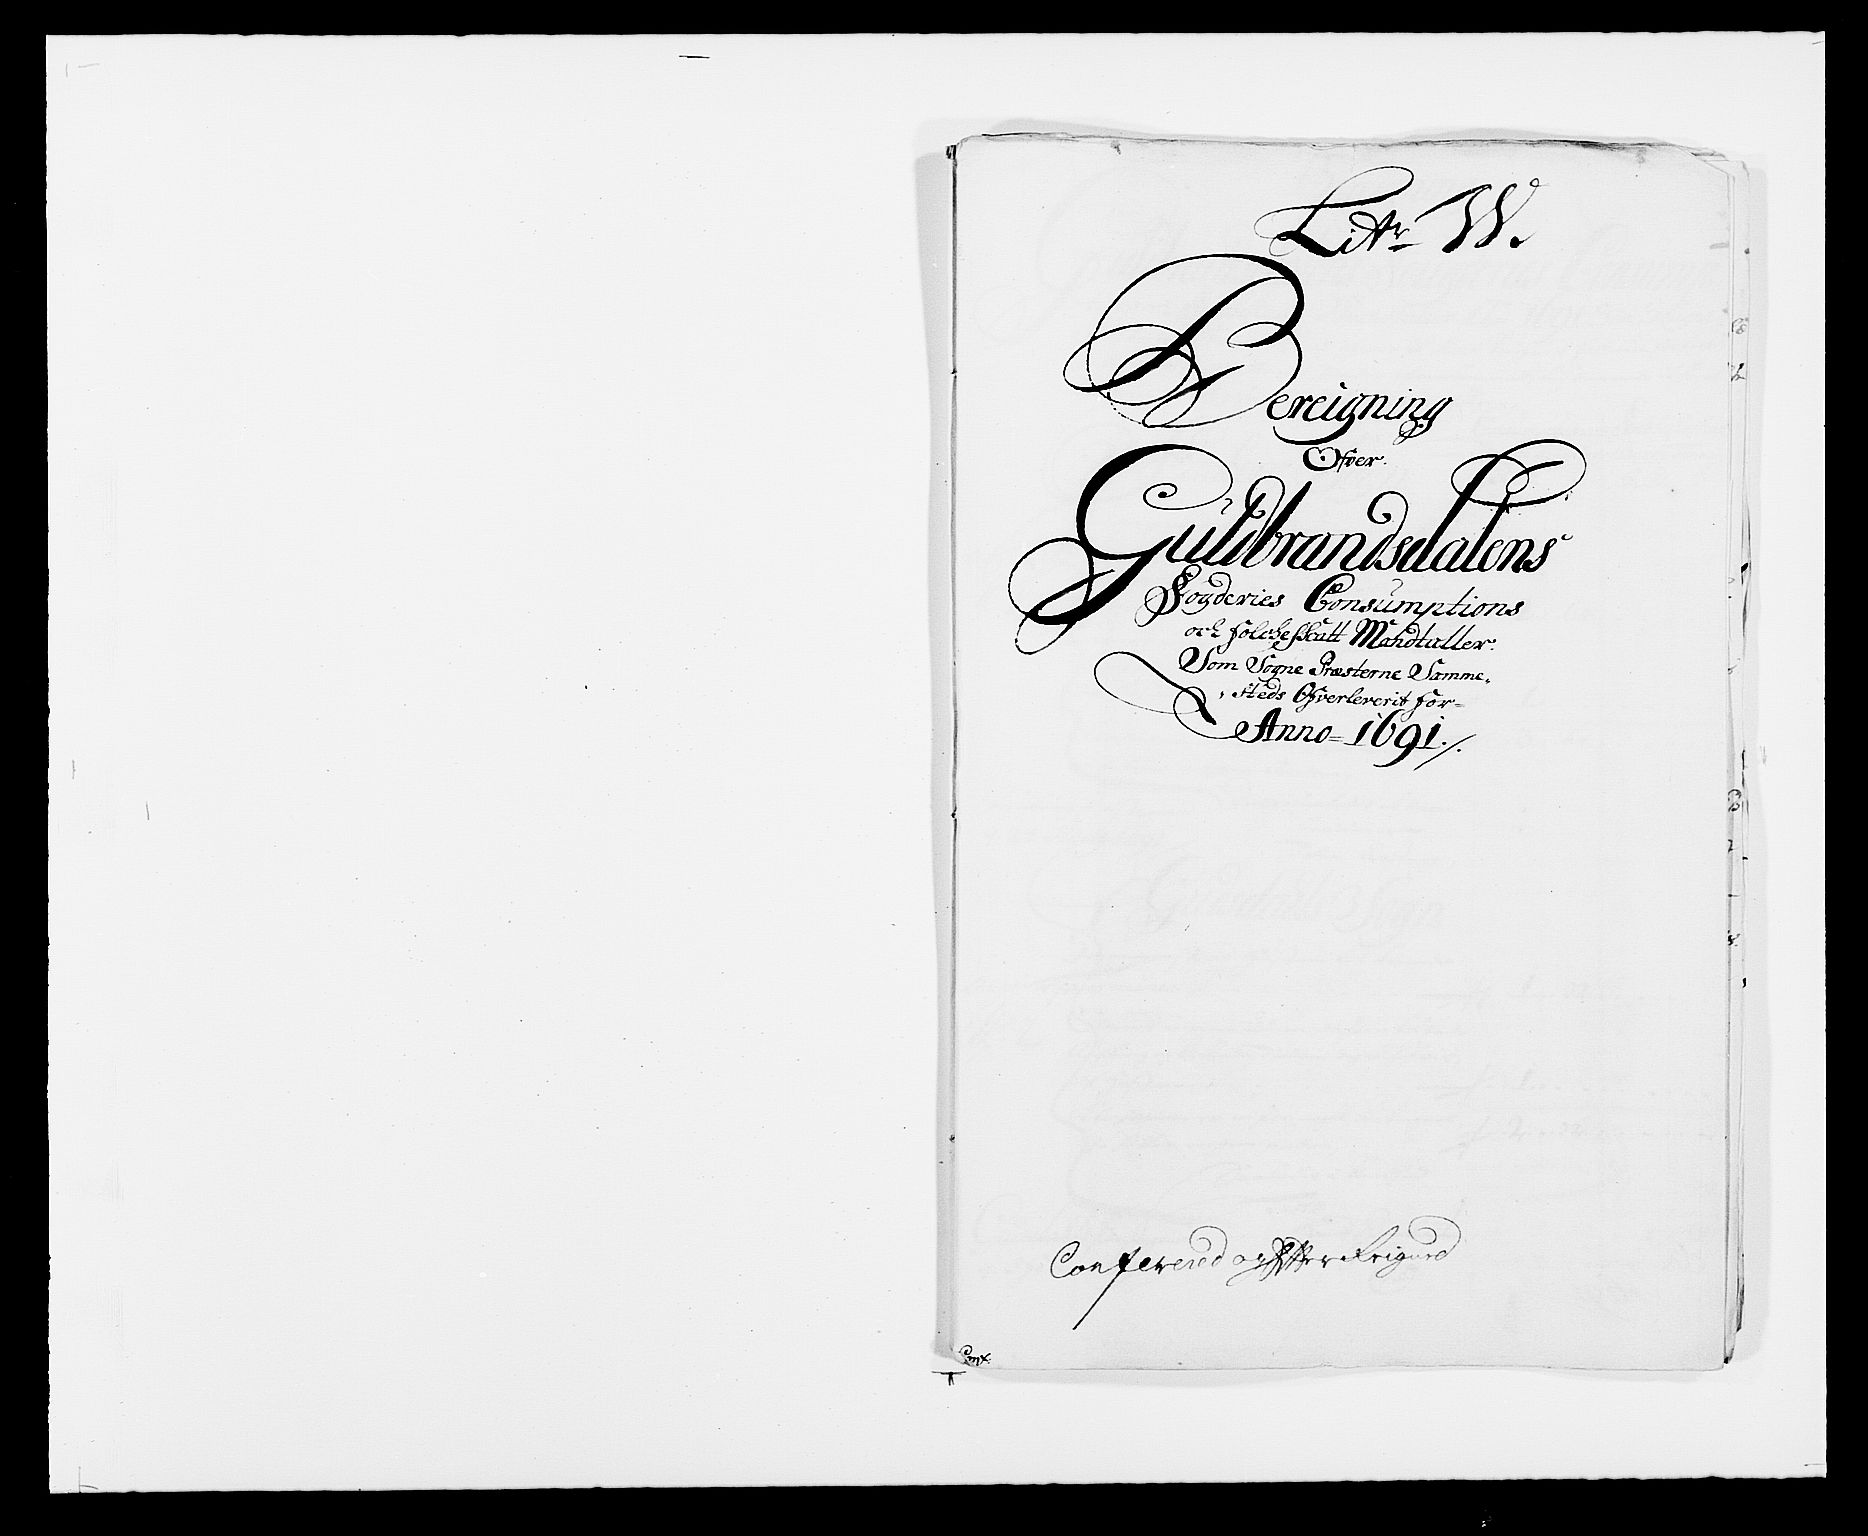 RA, Rentekammeret inntil 1814, Reviderte regnskaper, Fogderegnskap, R17/L1165: Fogderegnskap Gudbrandsdal, 1690-1692, s. 333